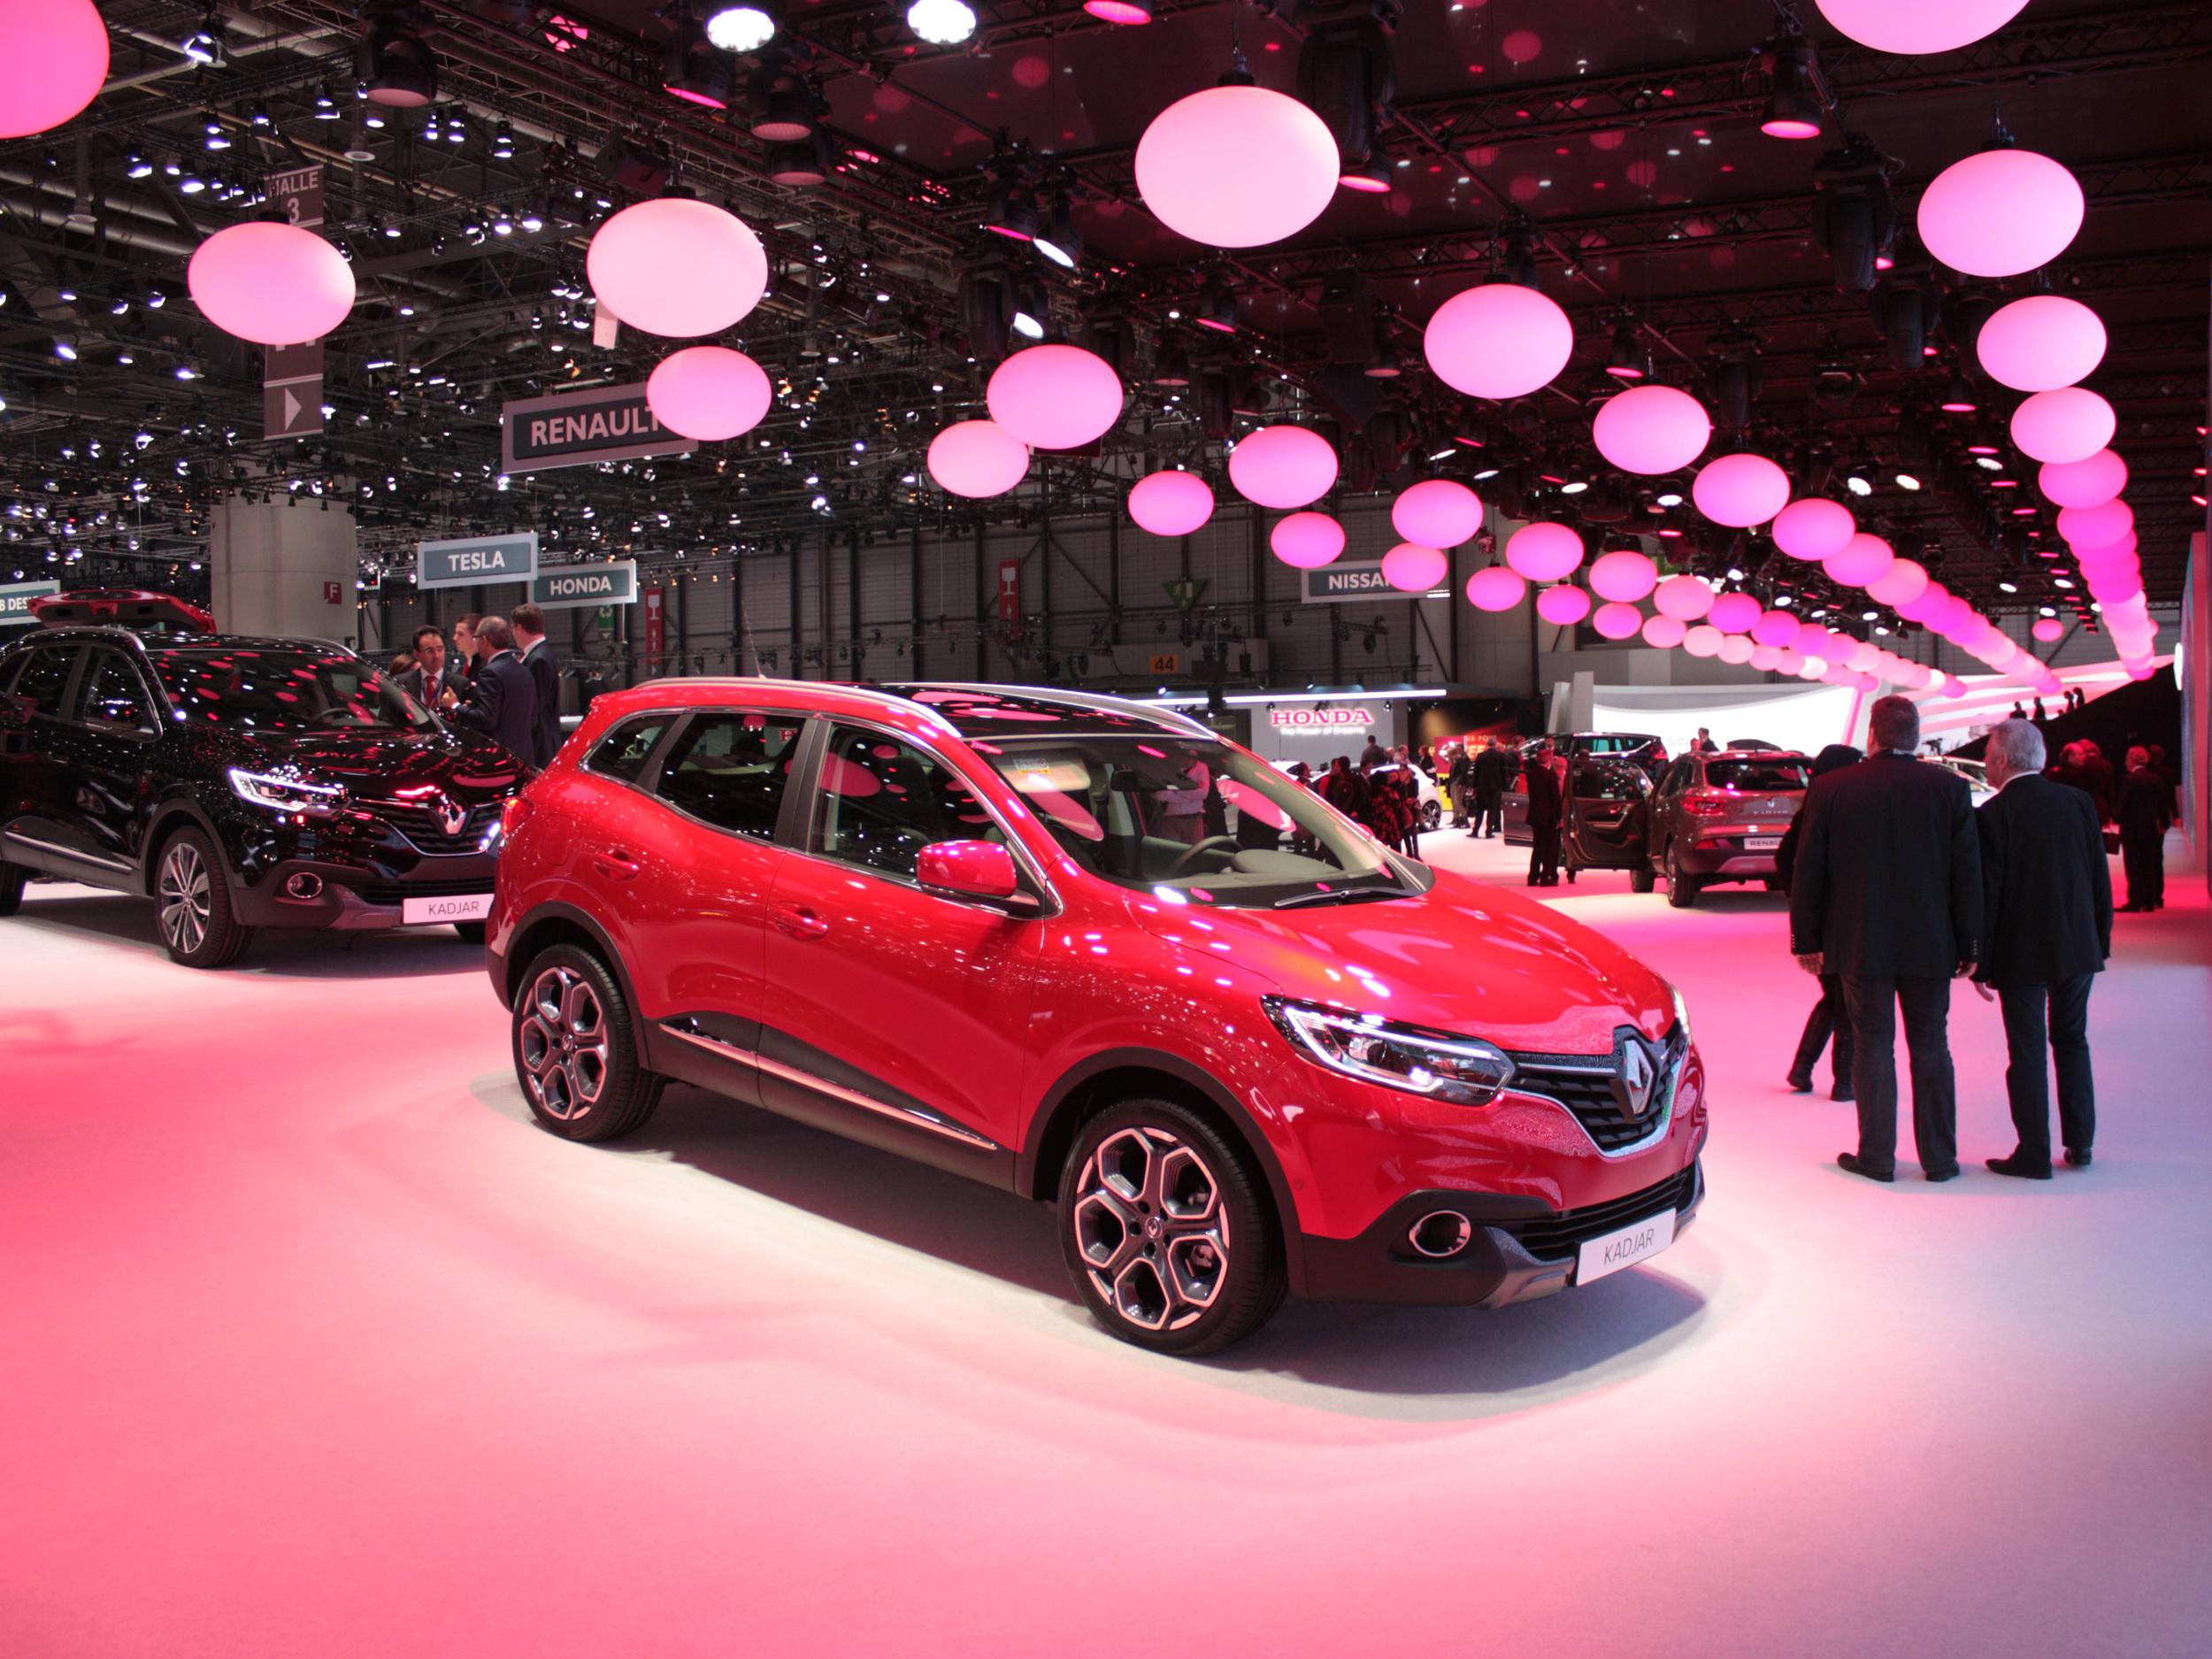 Geneva-Renault-Kadjar-front.jpg